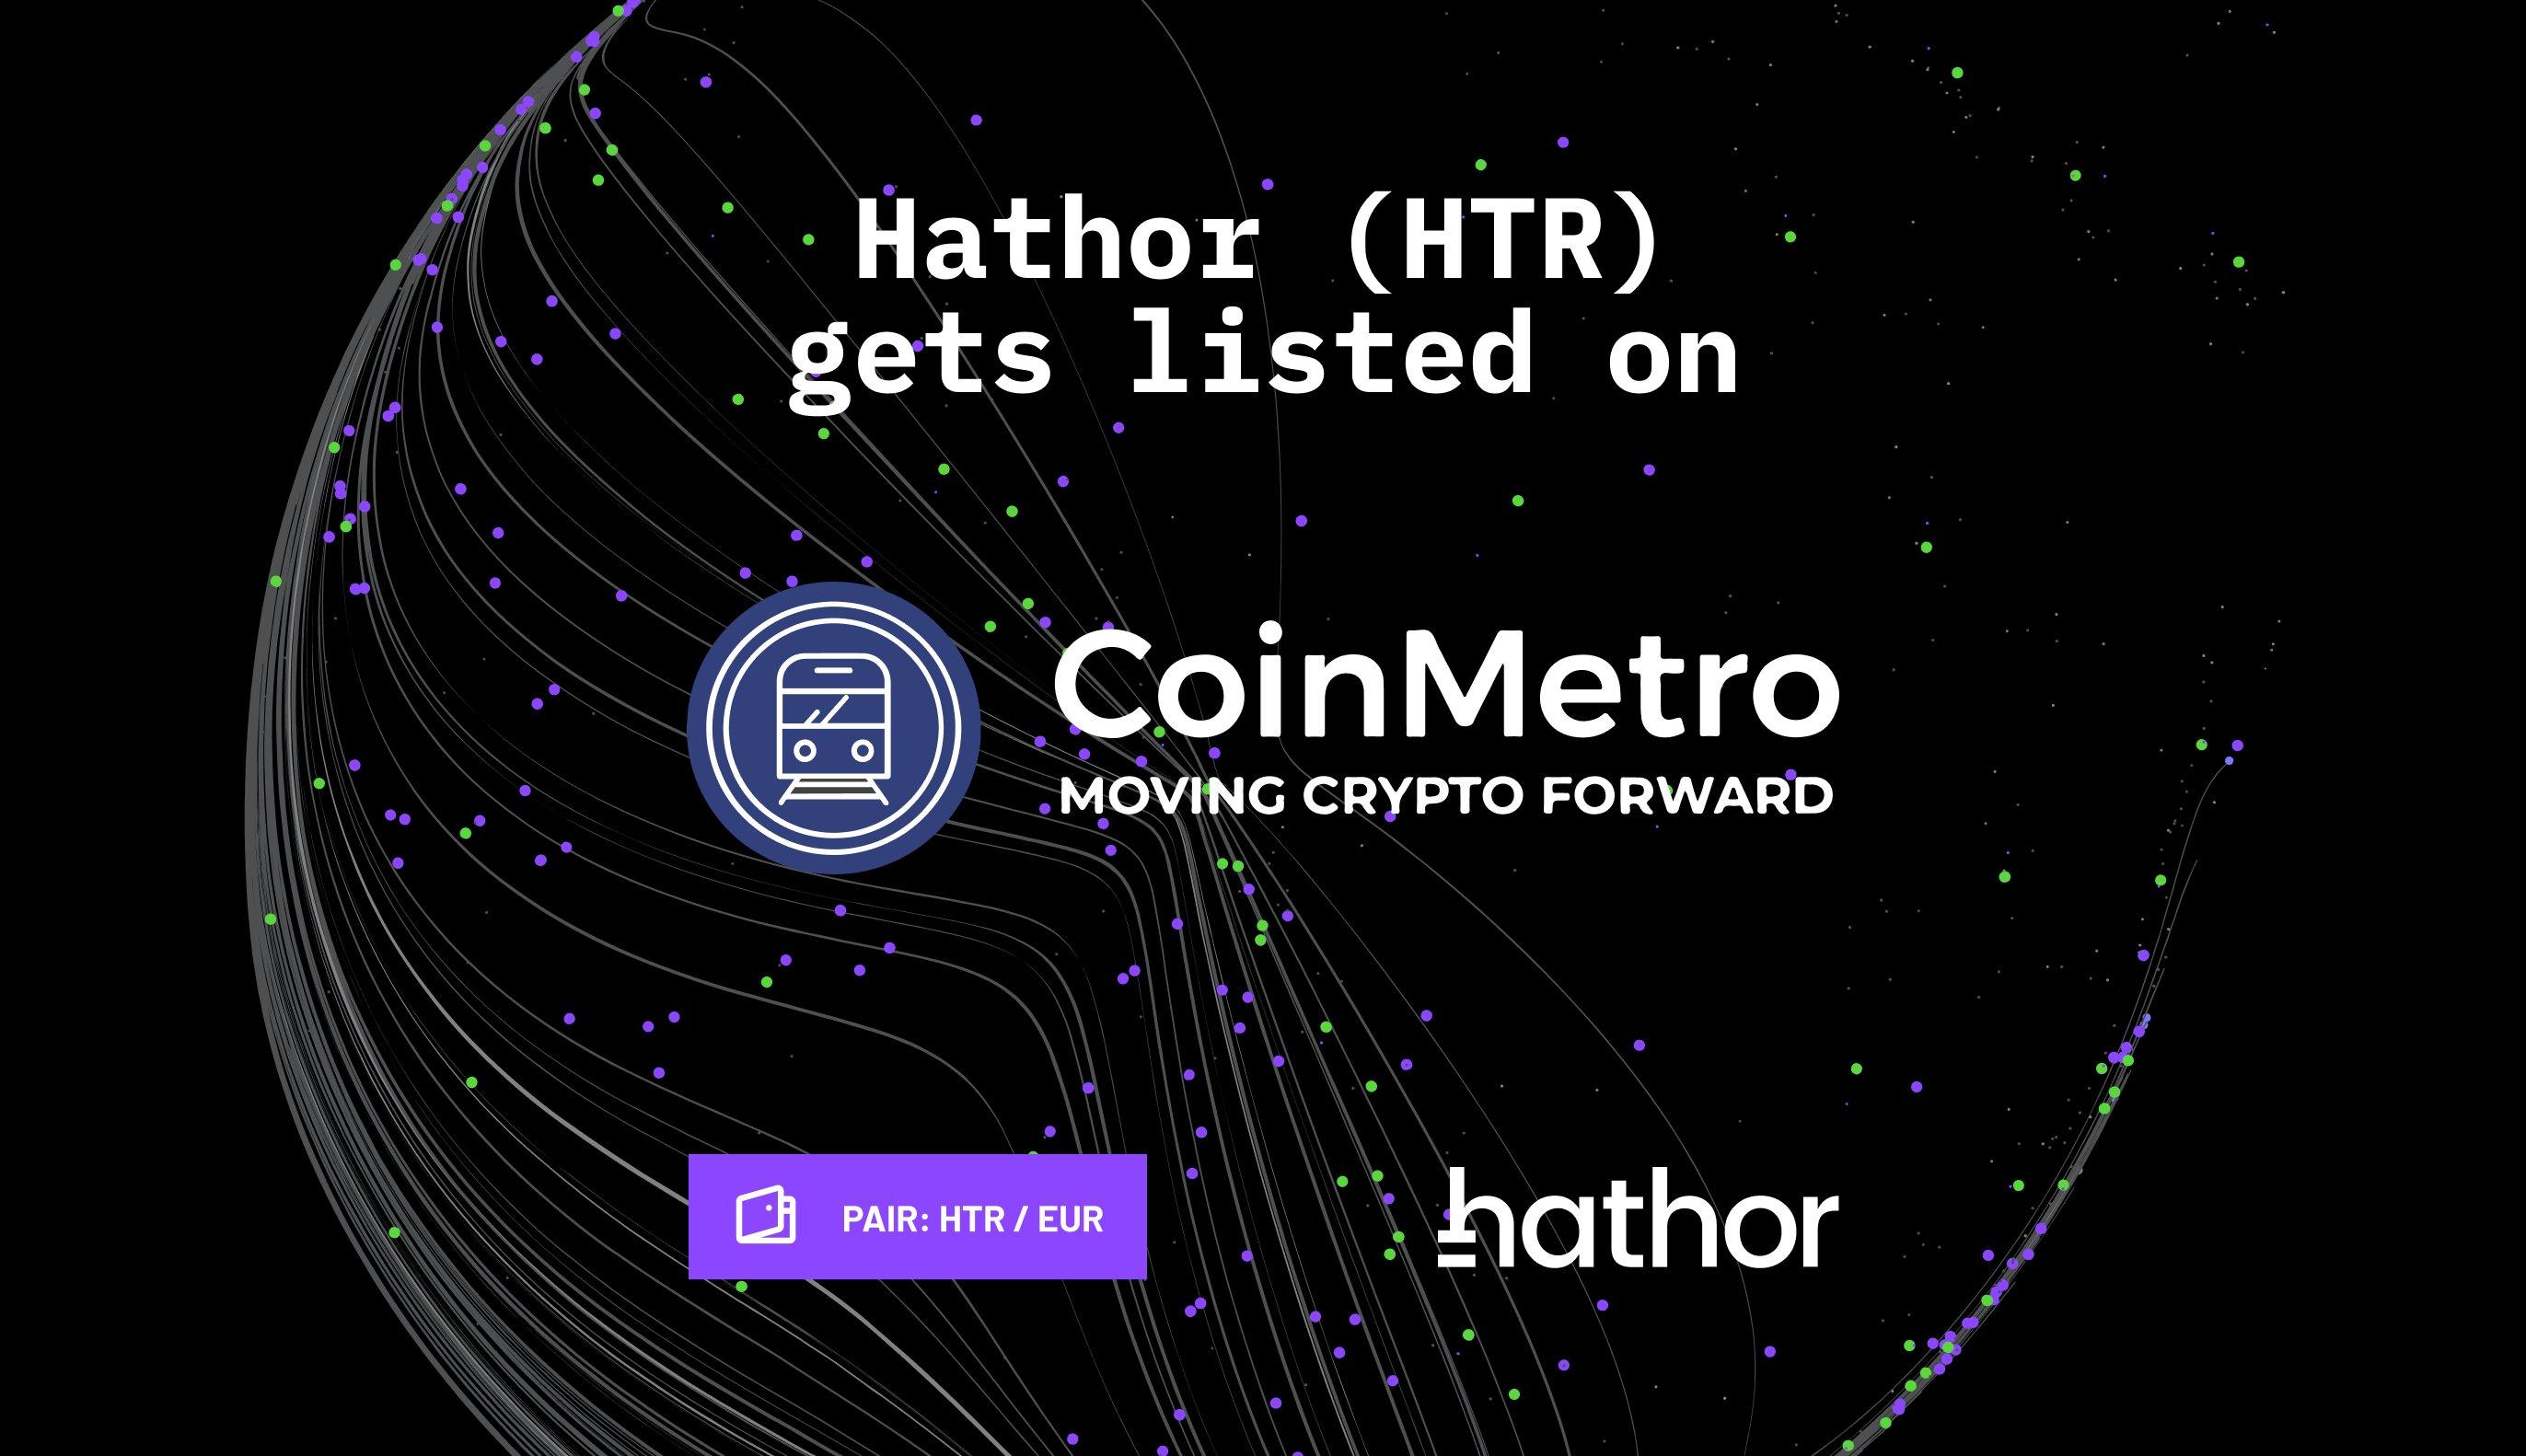 Hathor Network's HTR is listed on CoinMetro